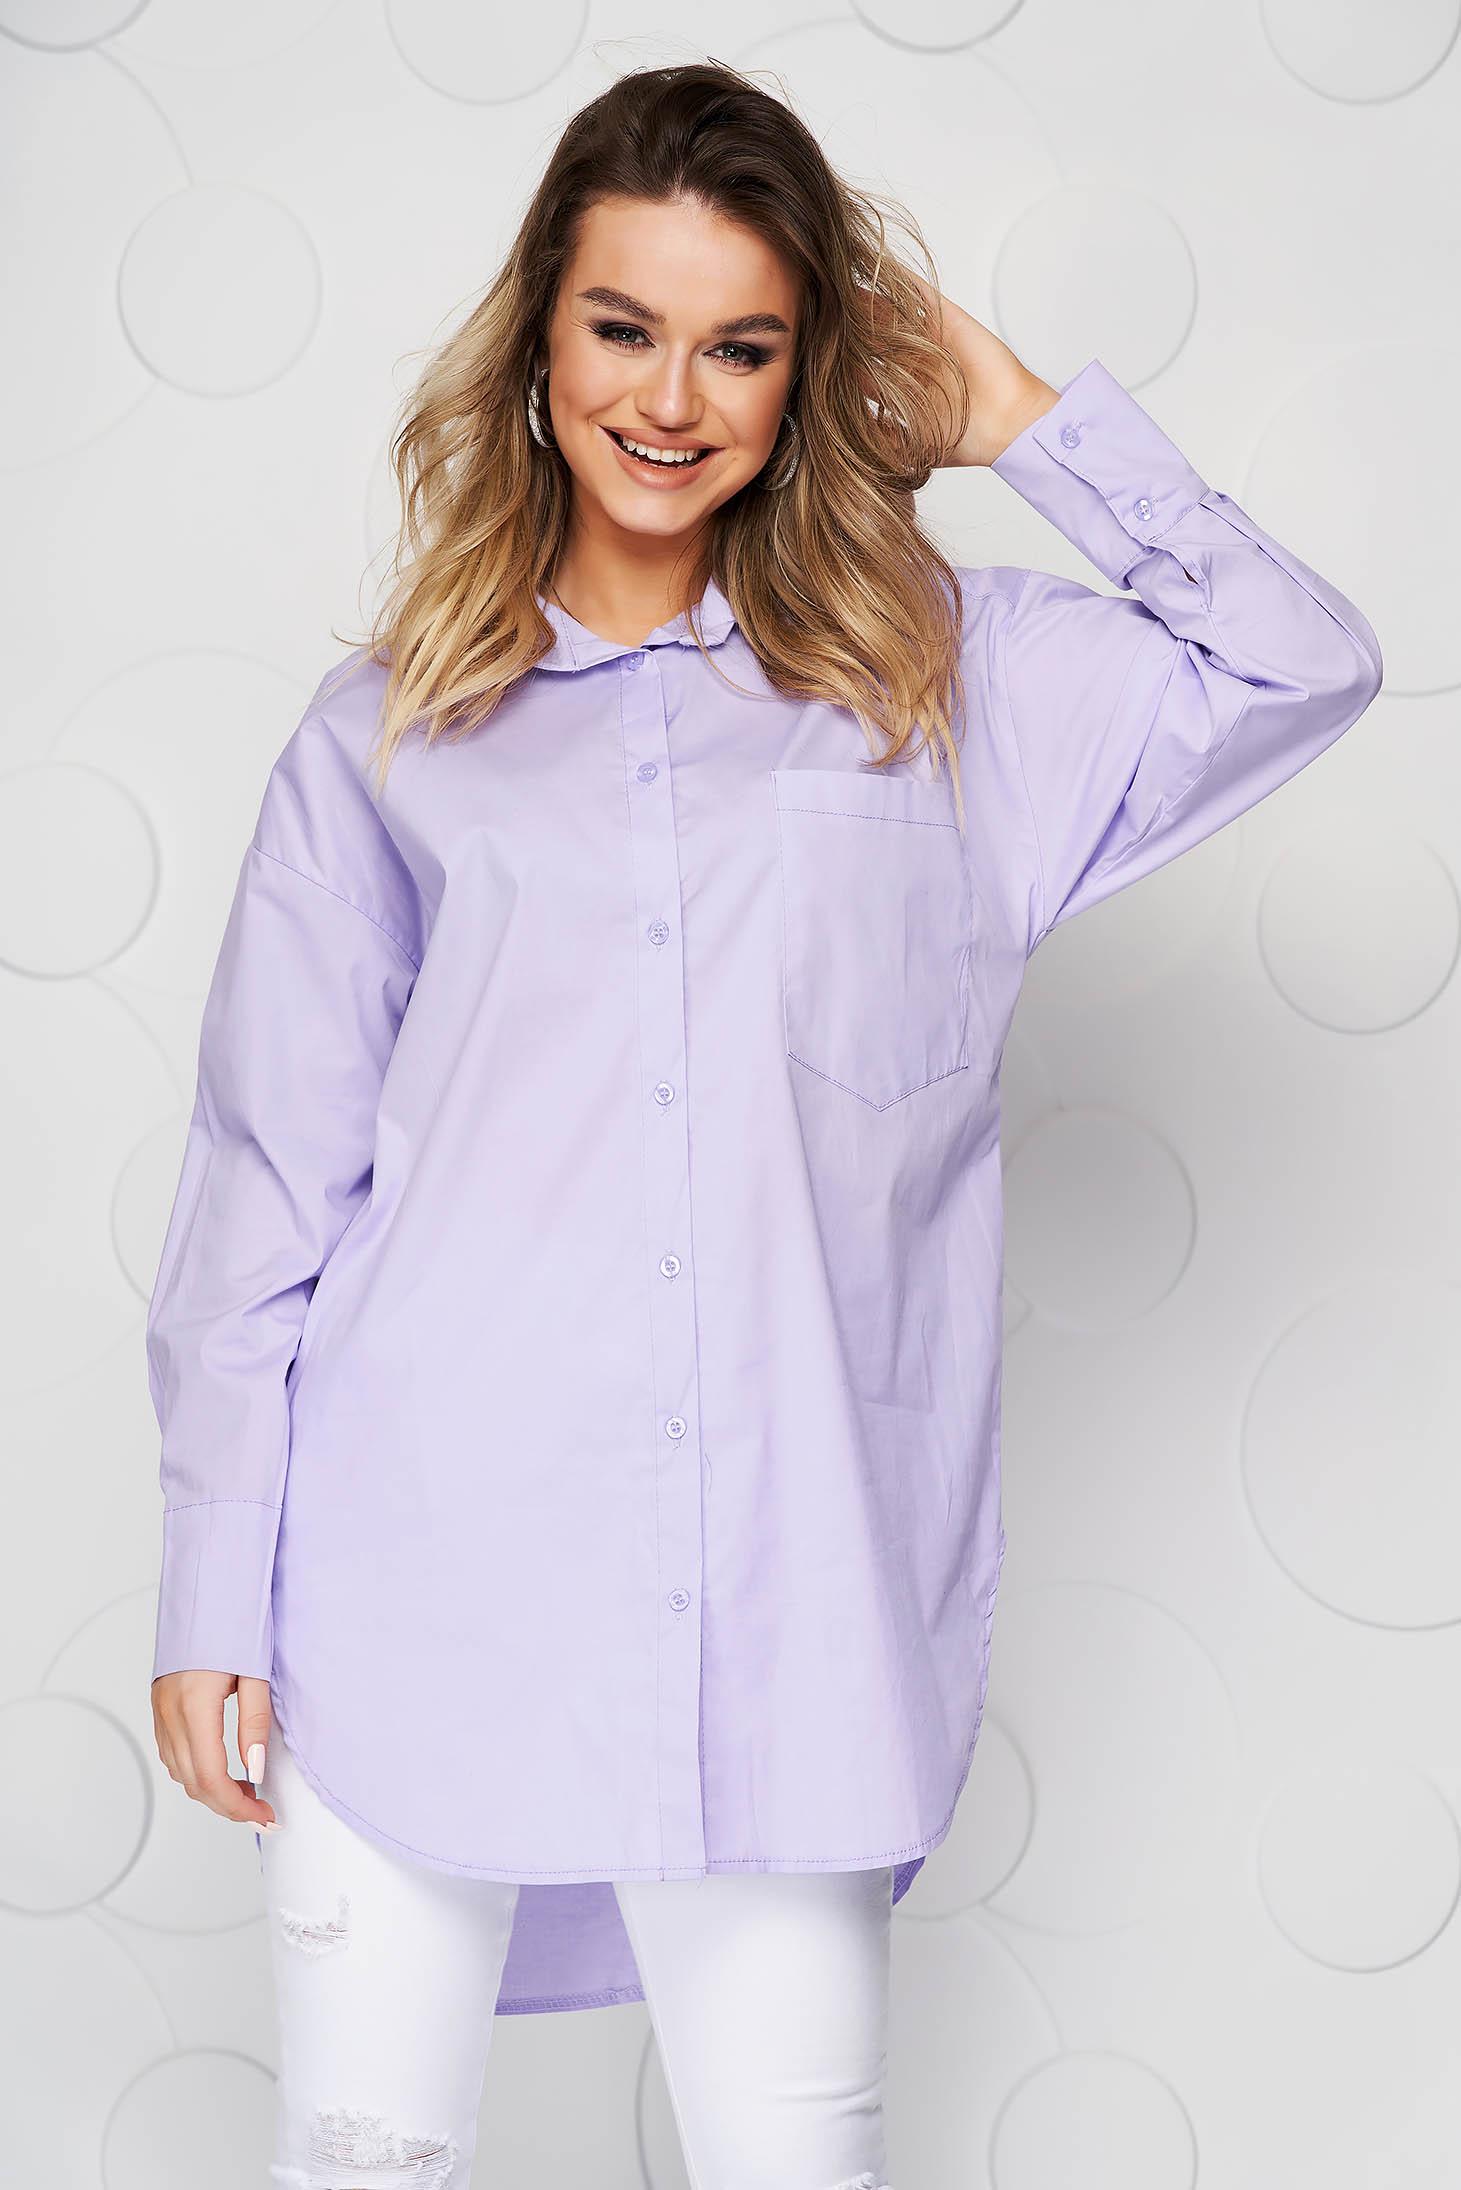 Lila women`s shirt loose fit asymmetrical poplin, thin cotton